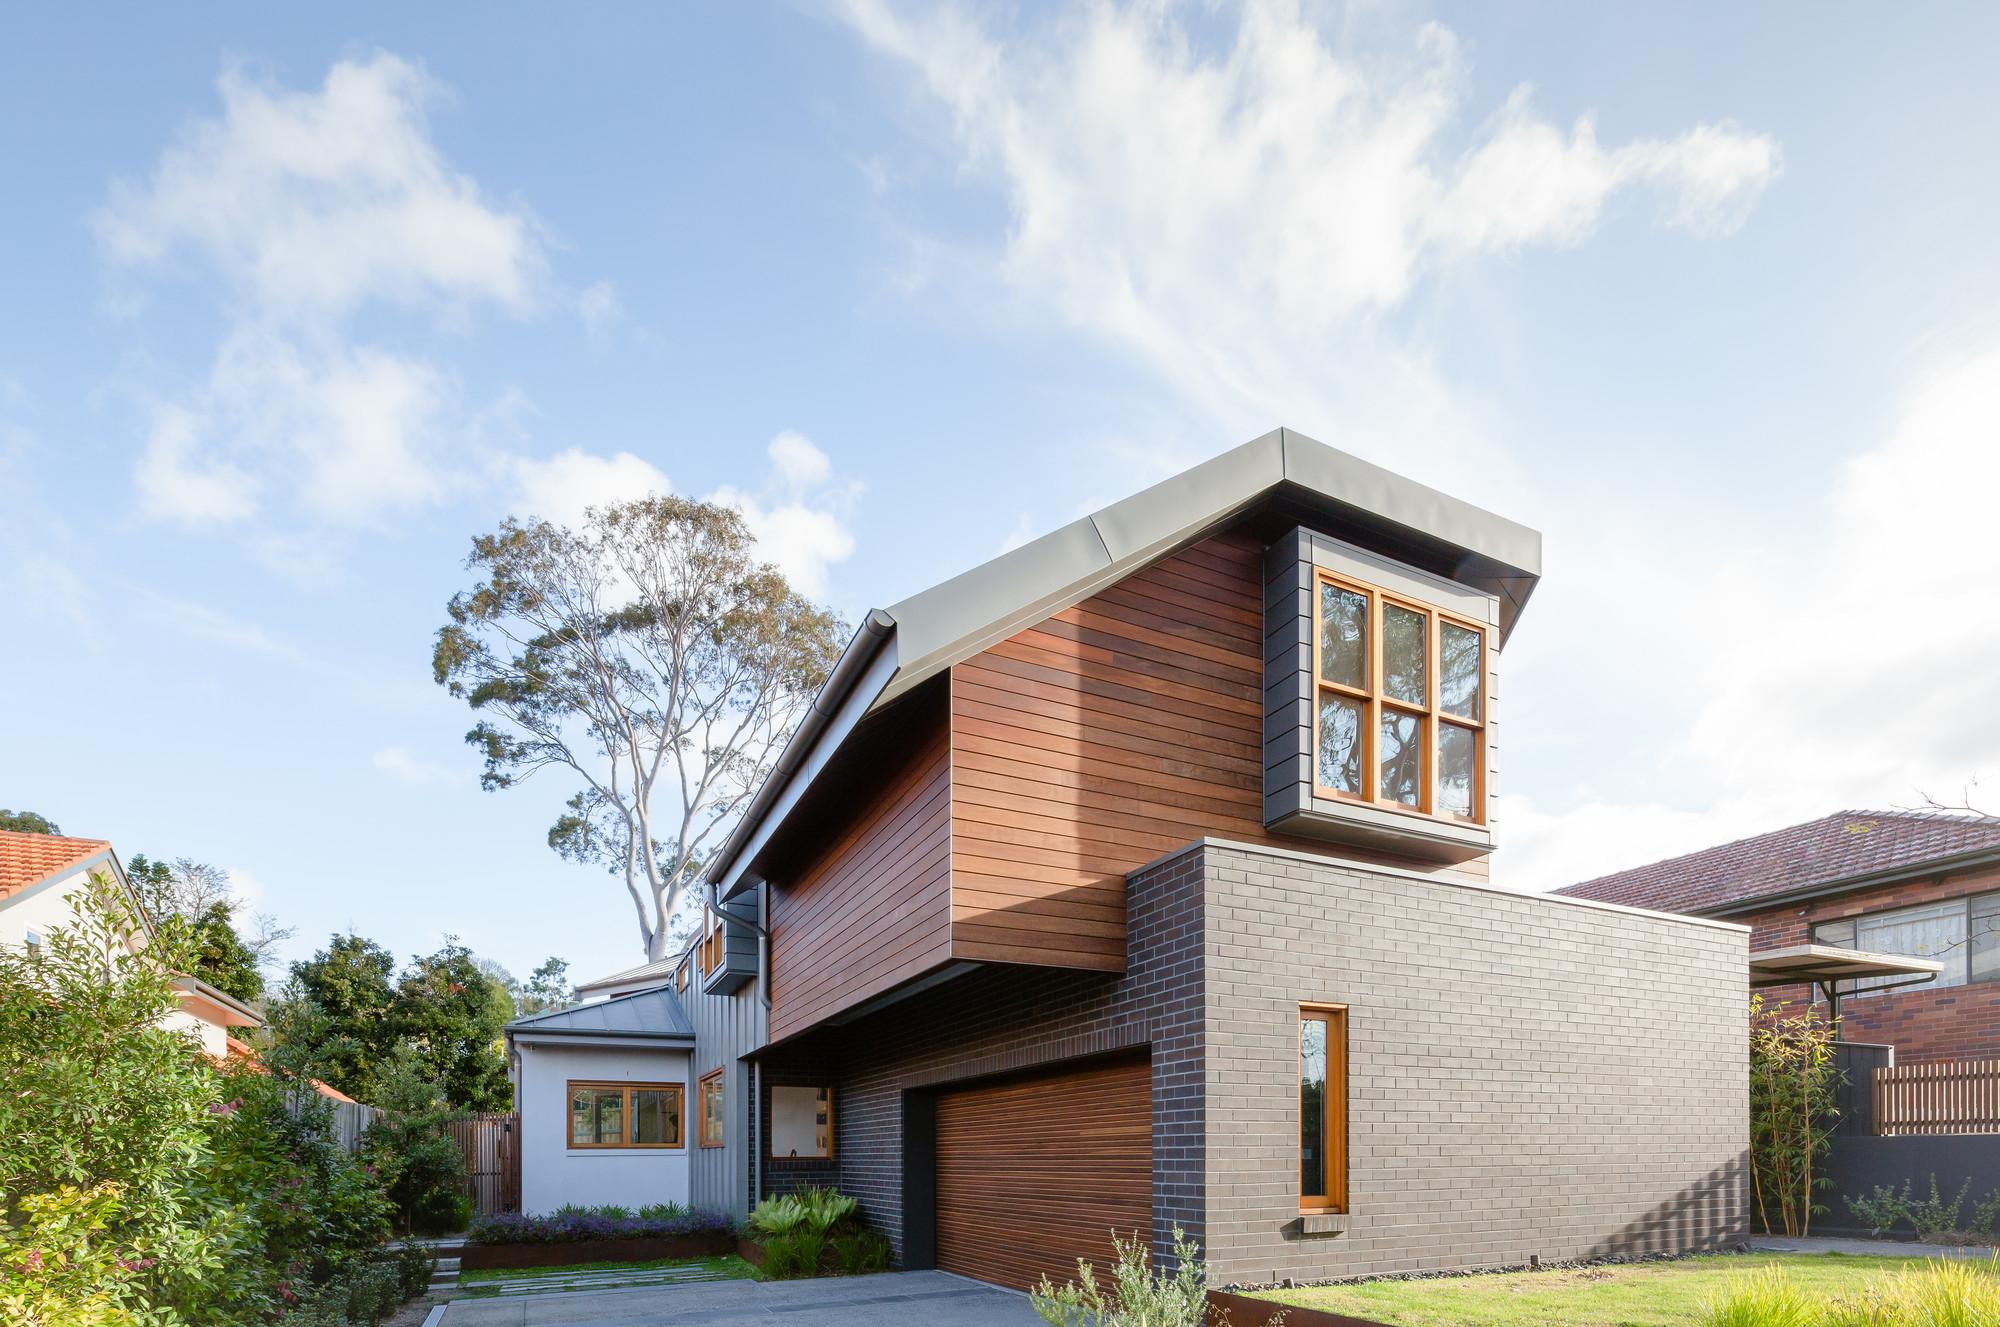 Modern Gable Architecture